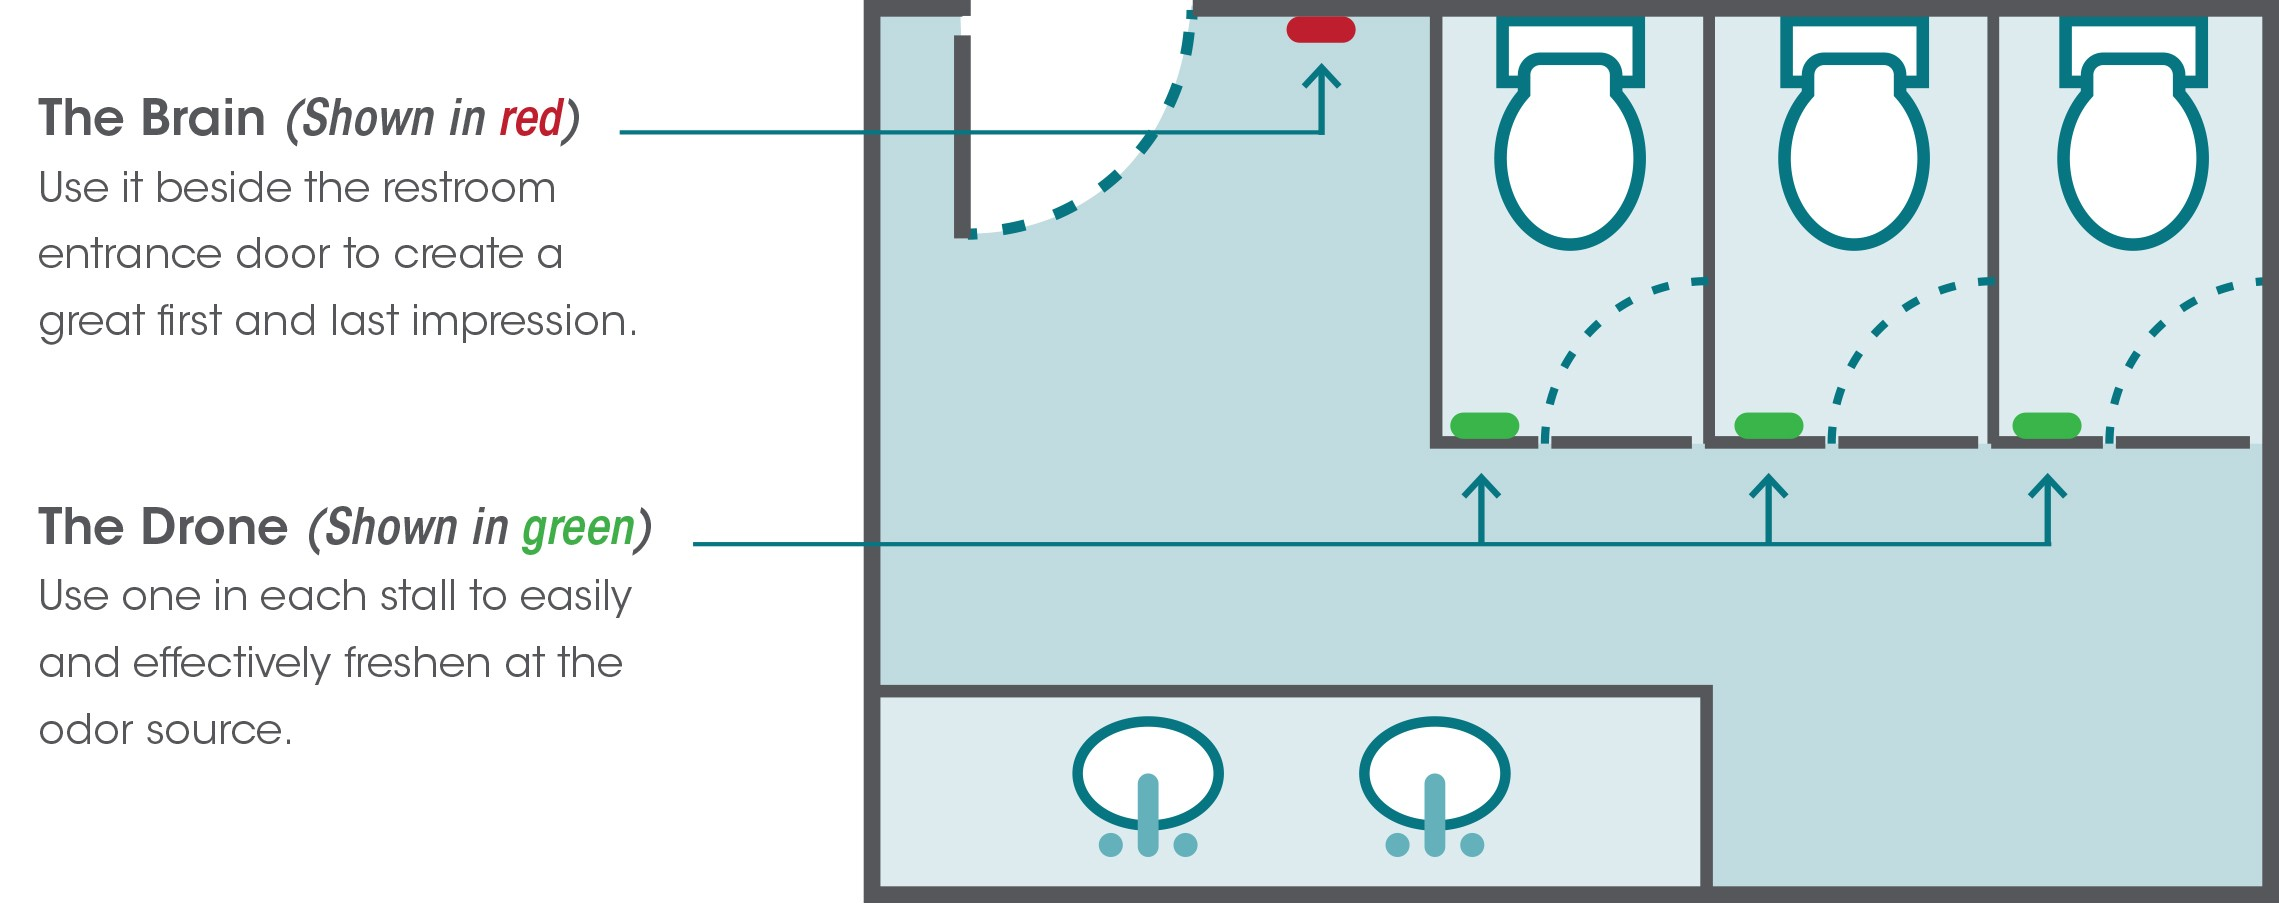 restroom air freshener